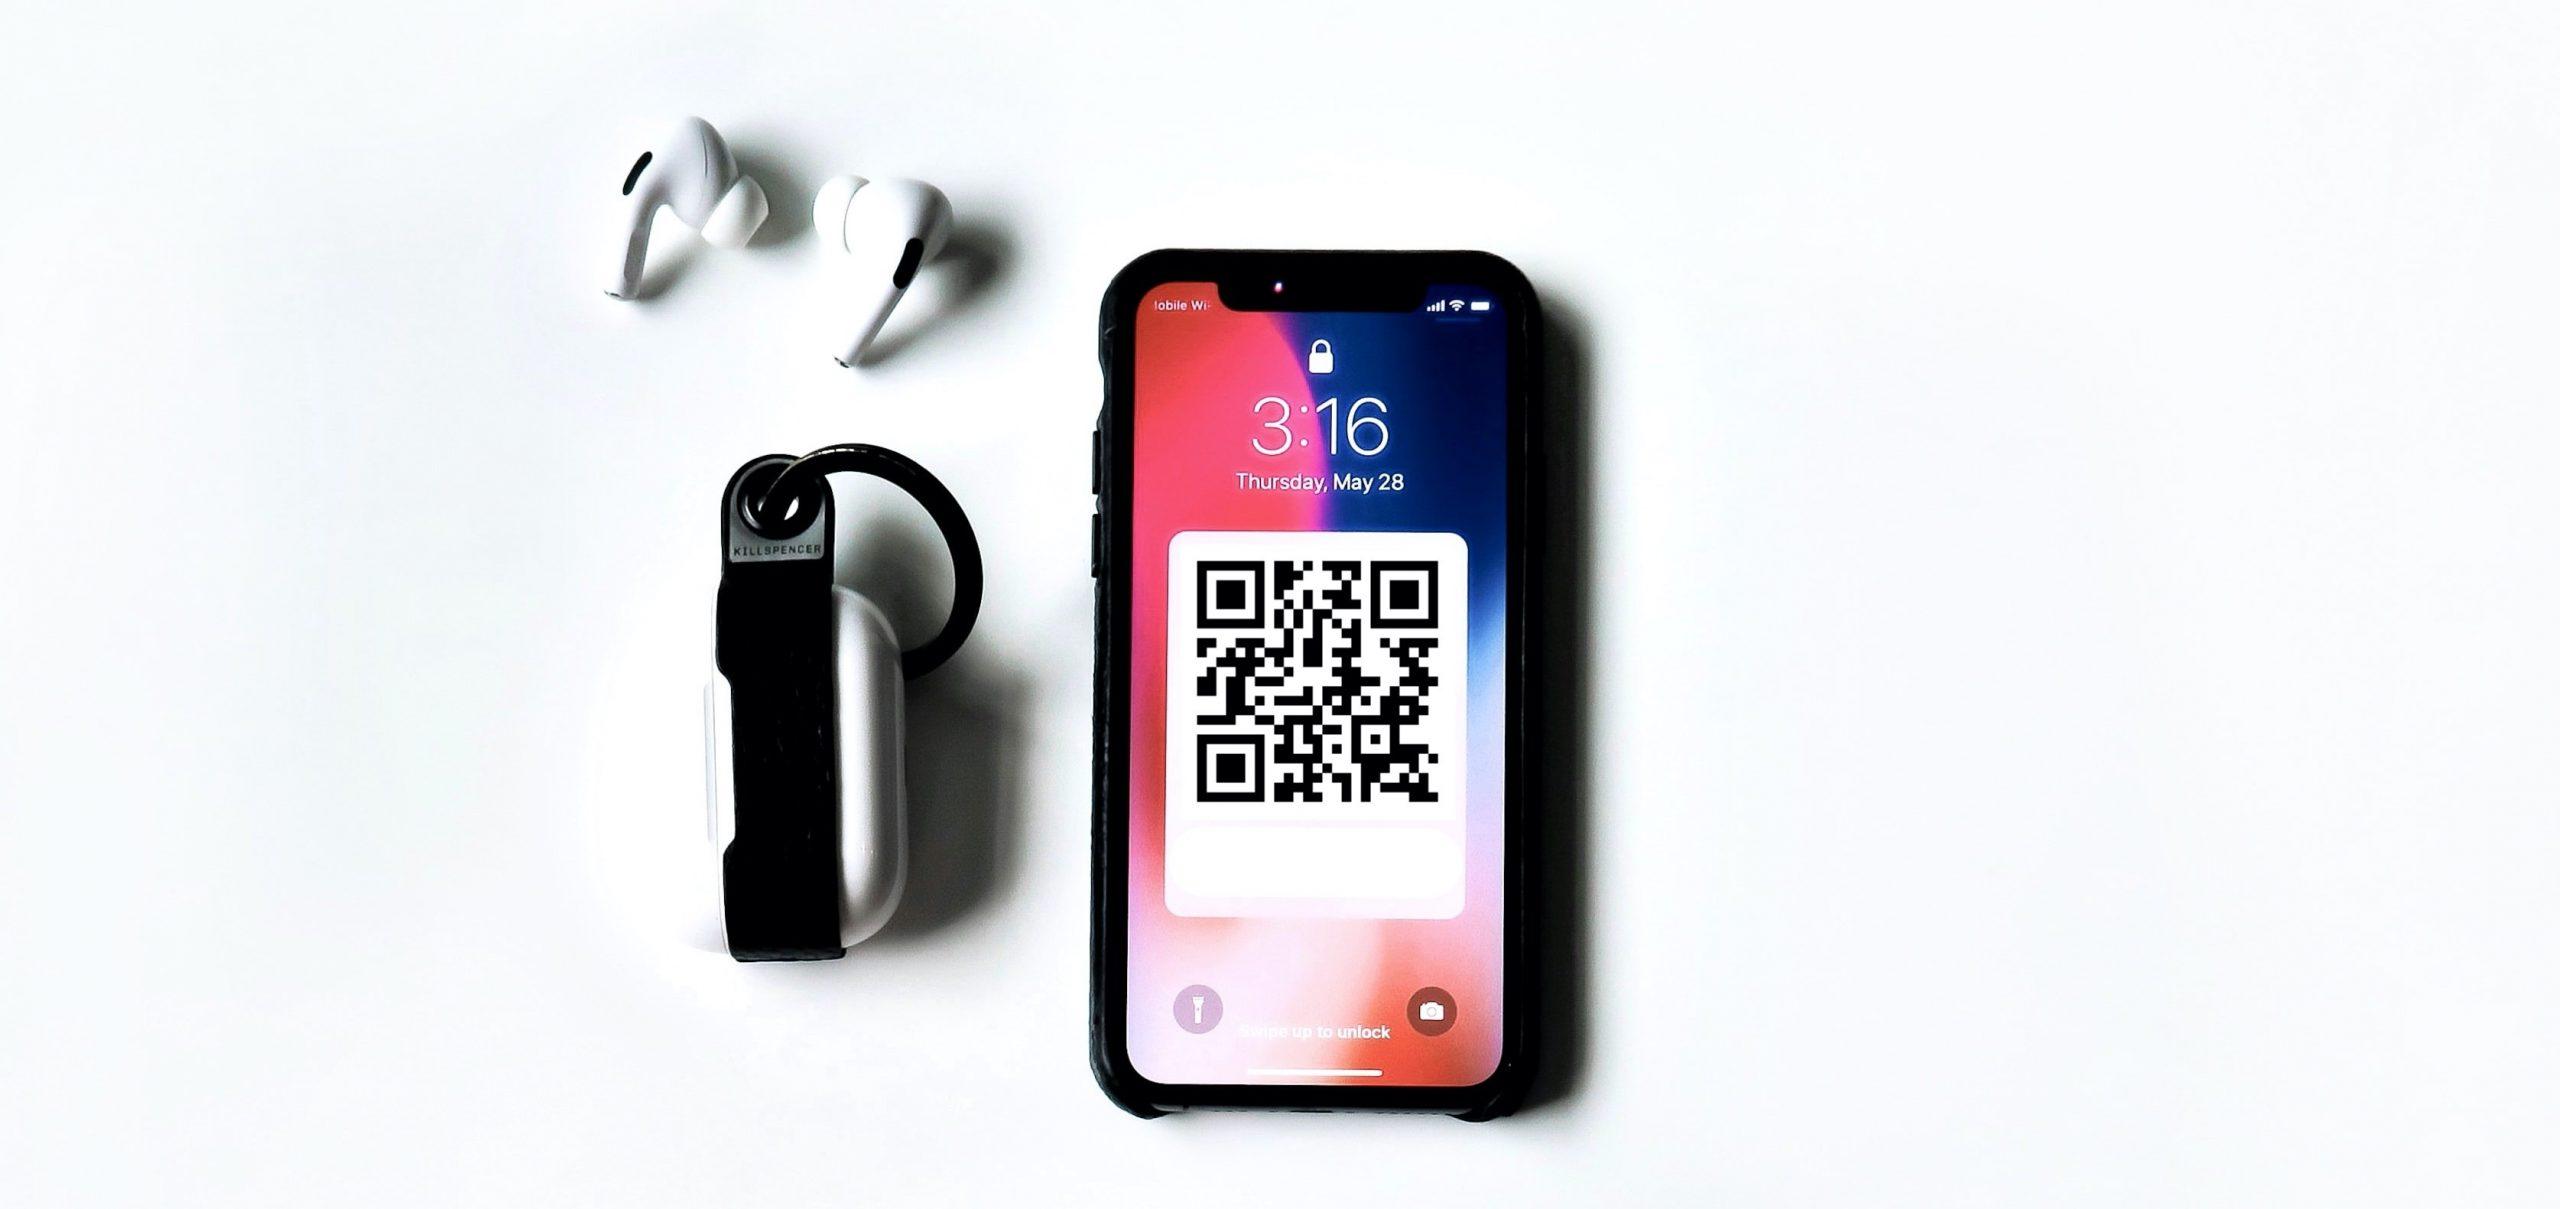 QR code on phone